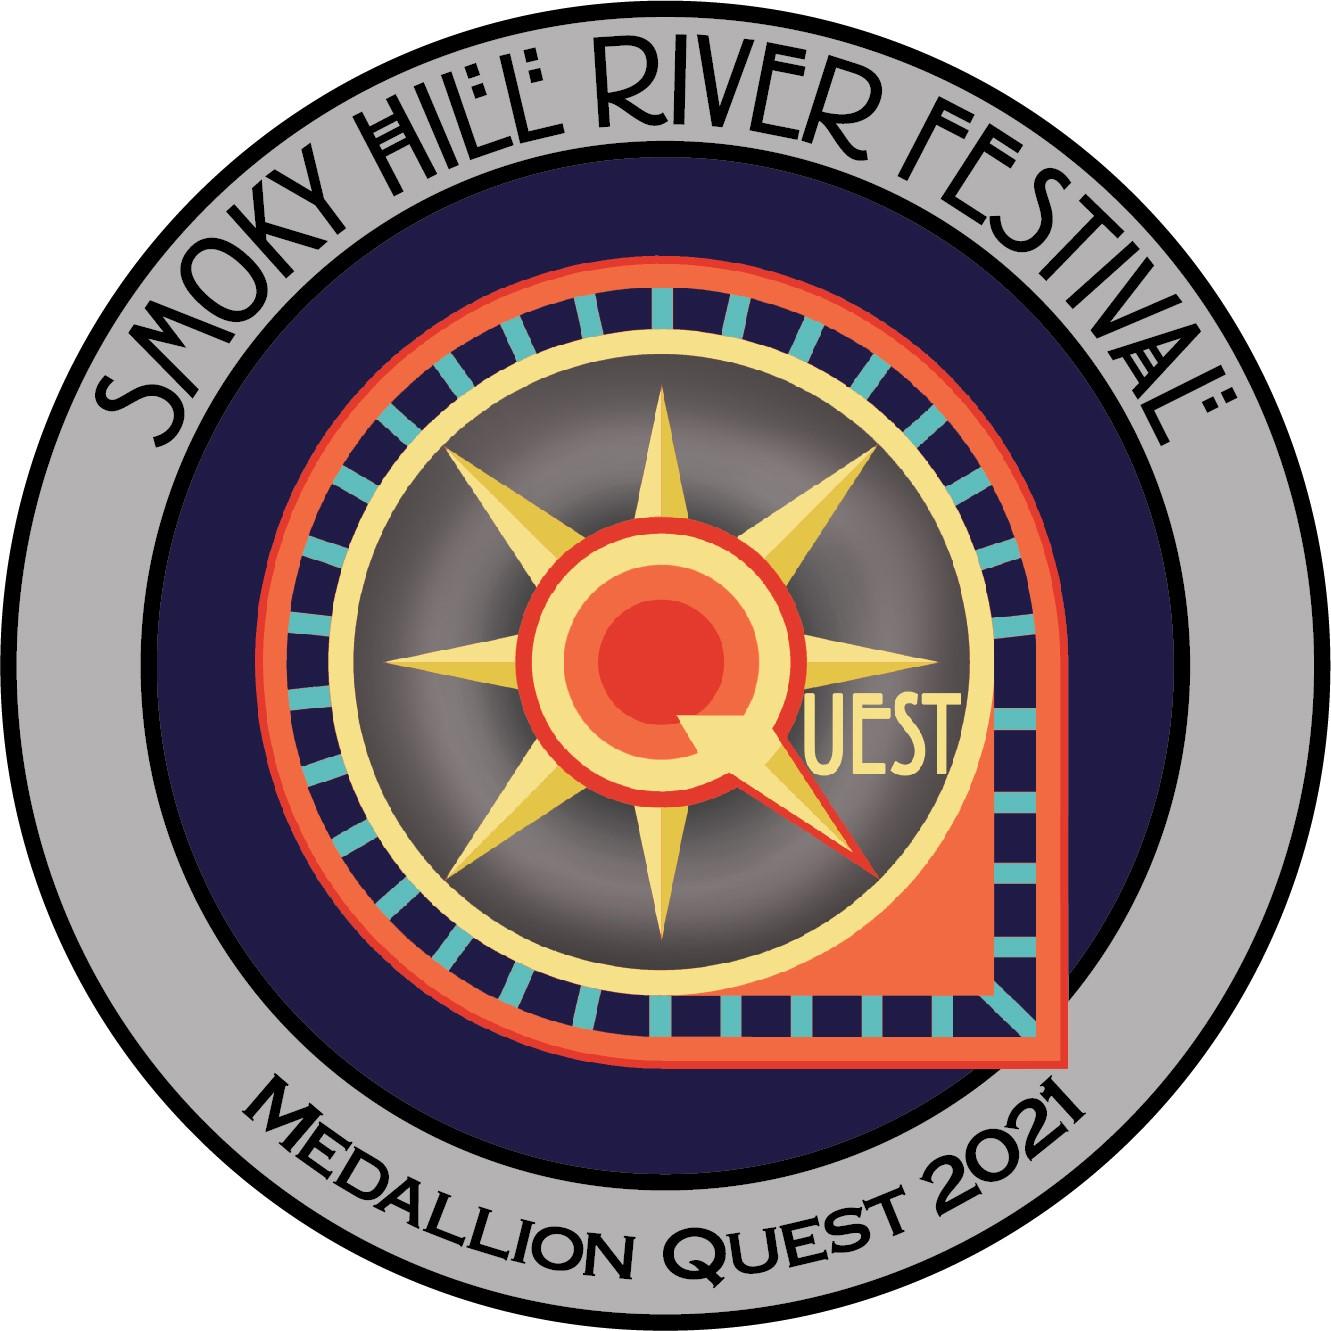 2021 Festival Medallion Quest